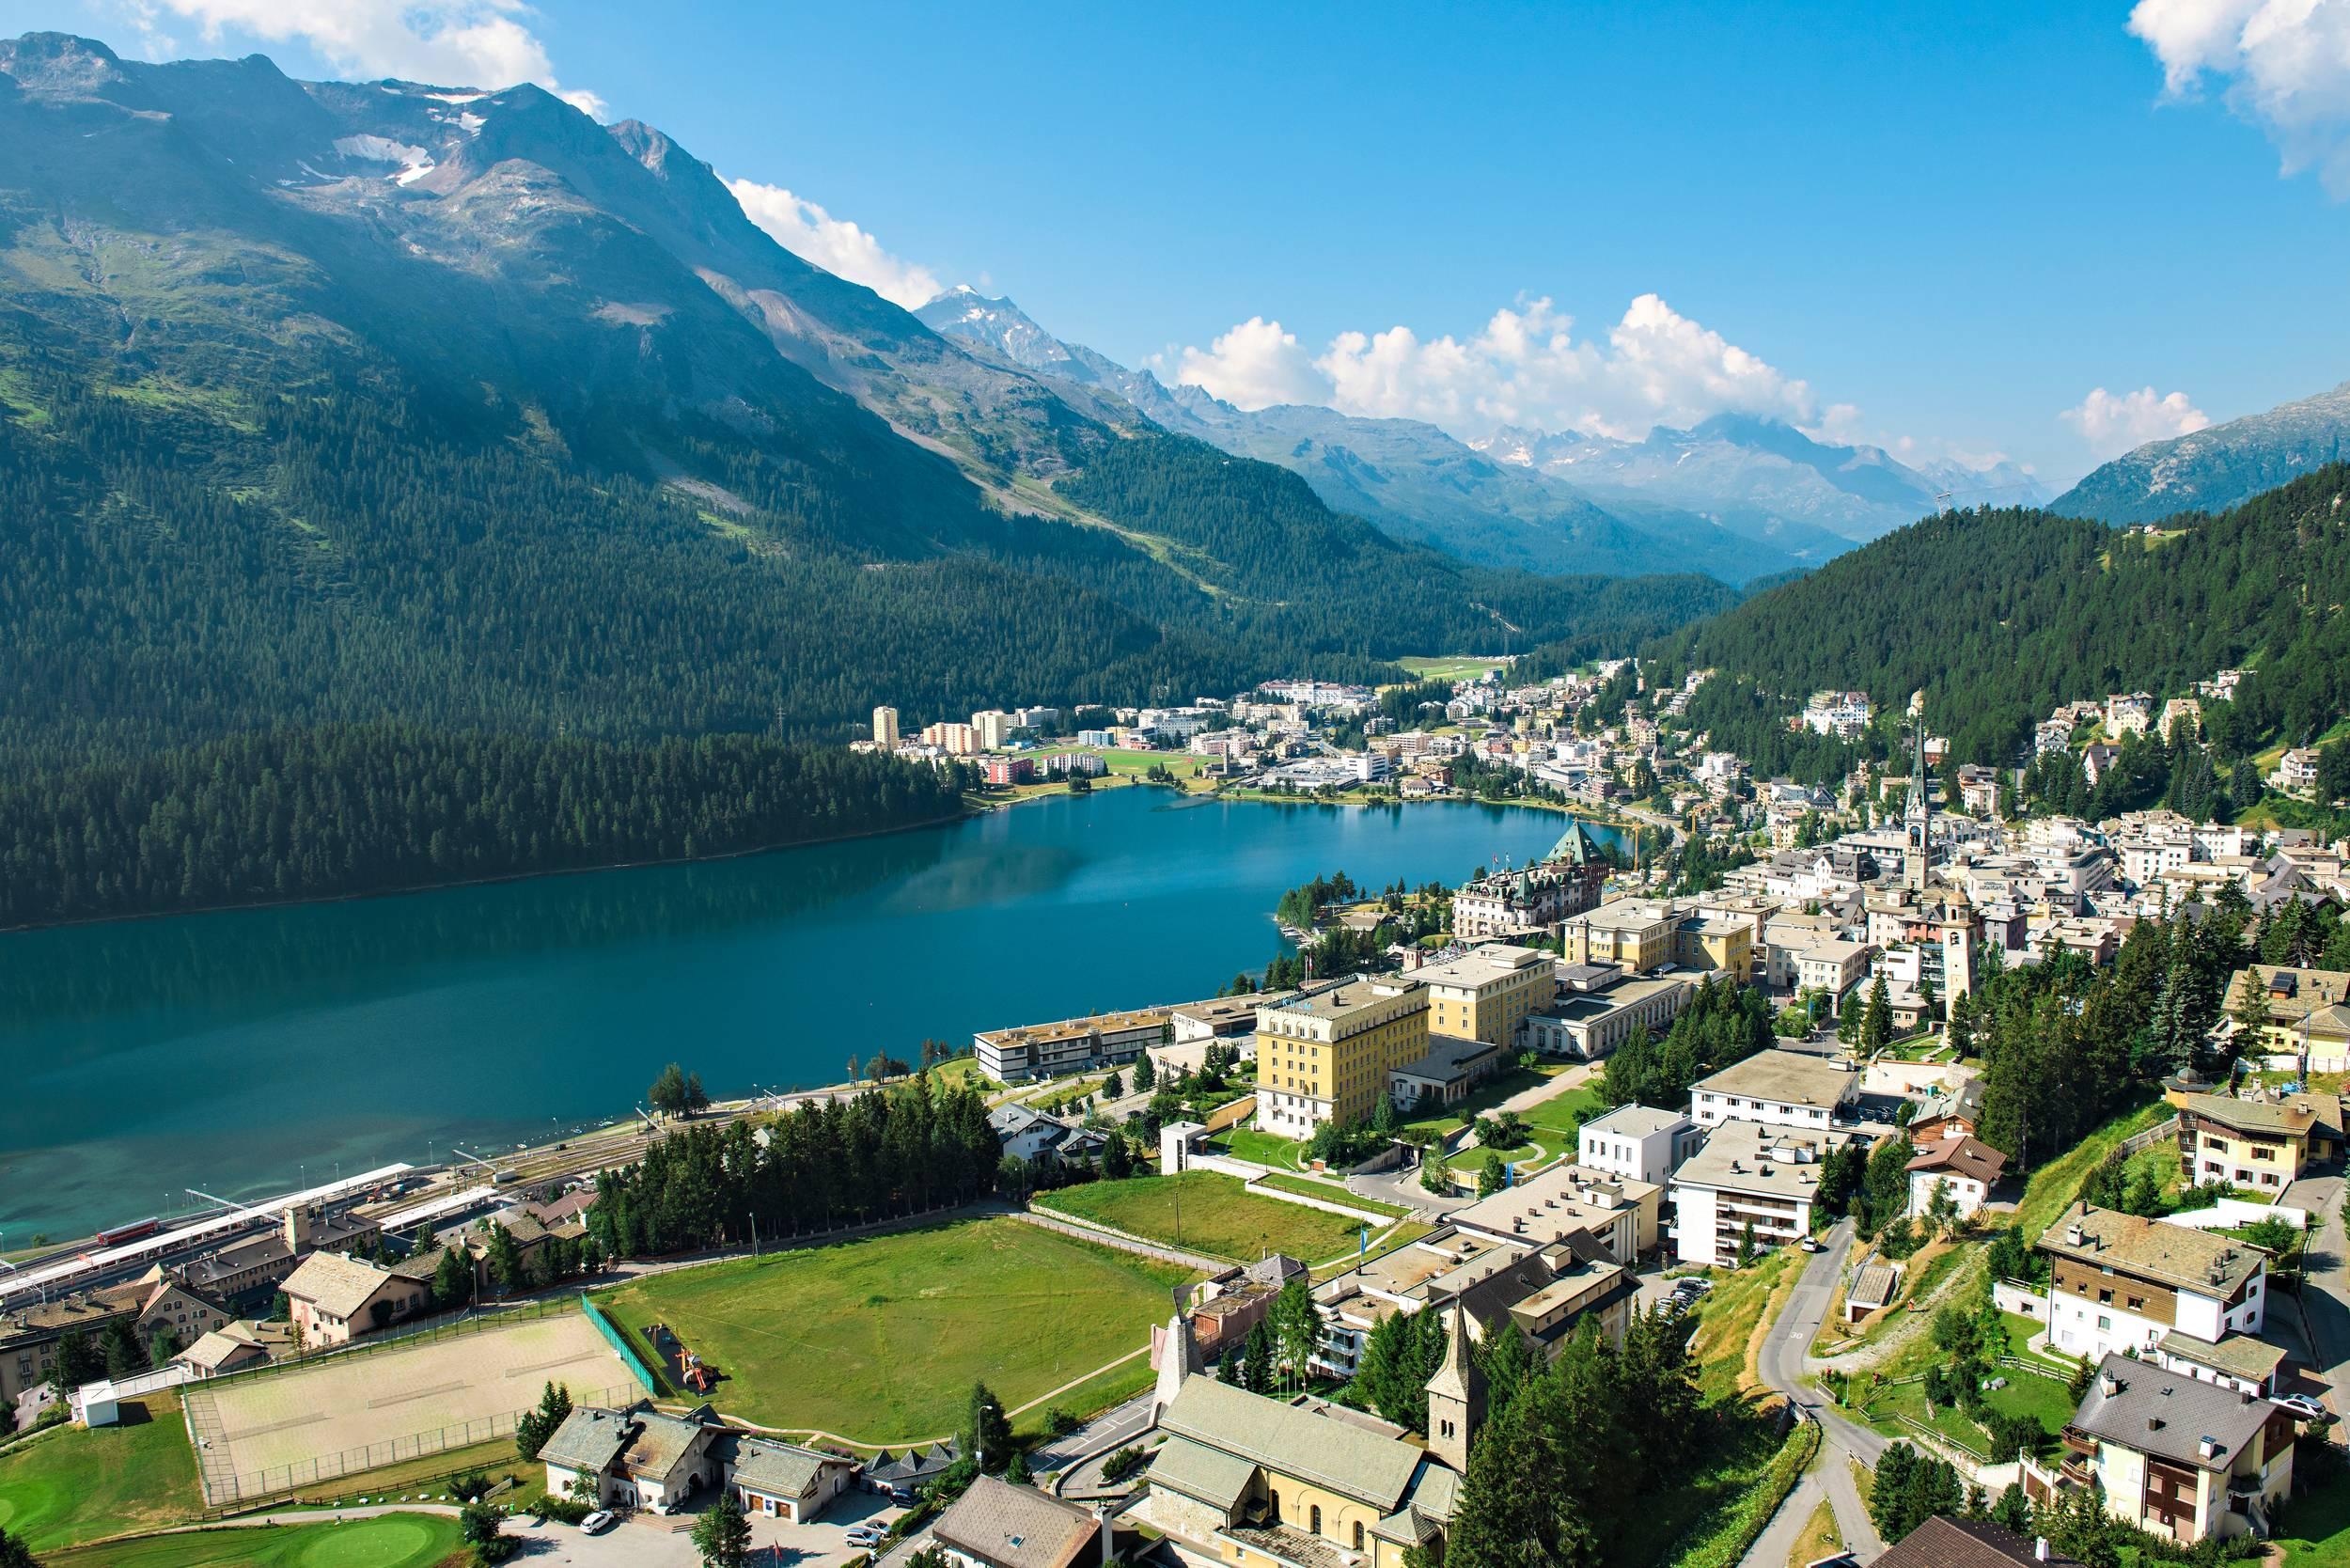 Hotel Kulm St Moritz